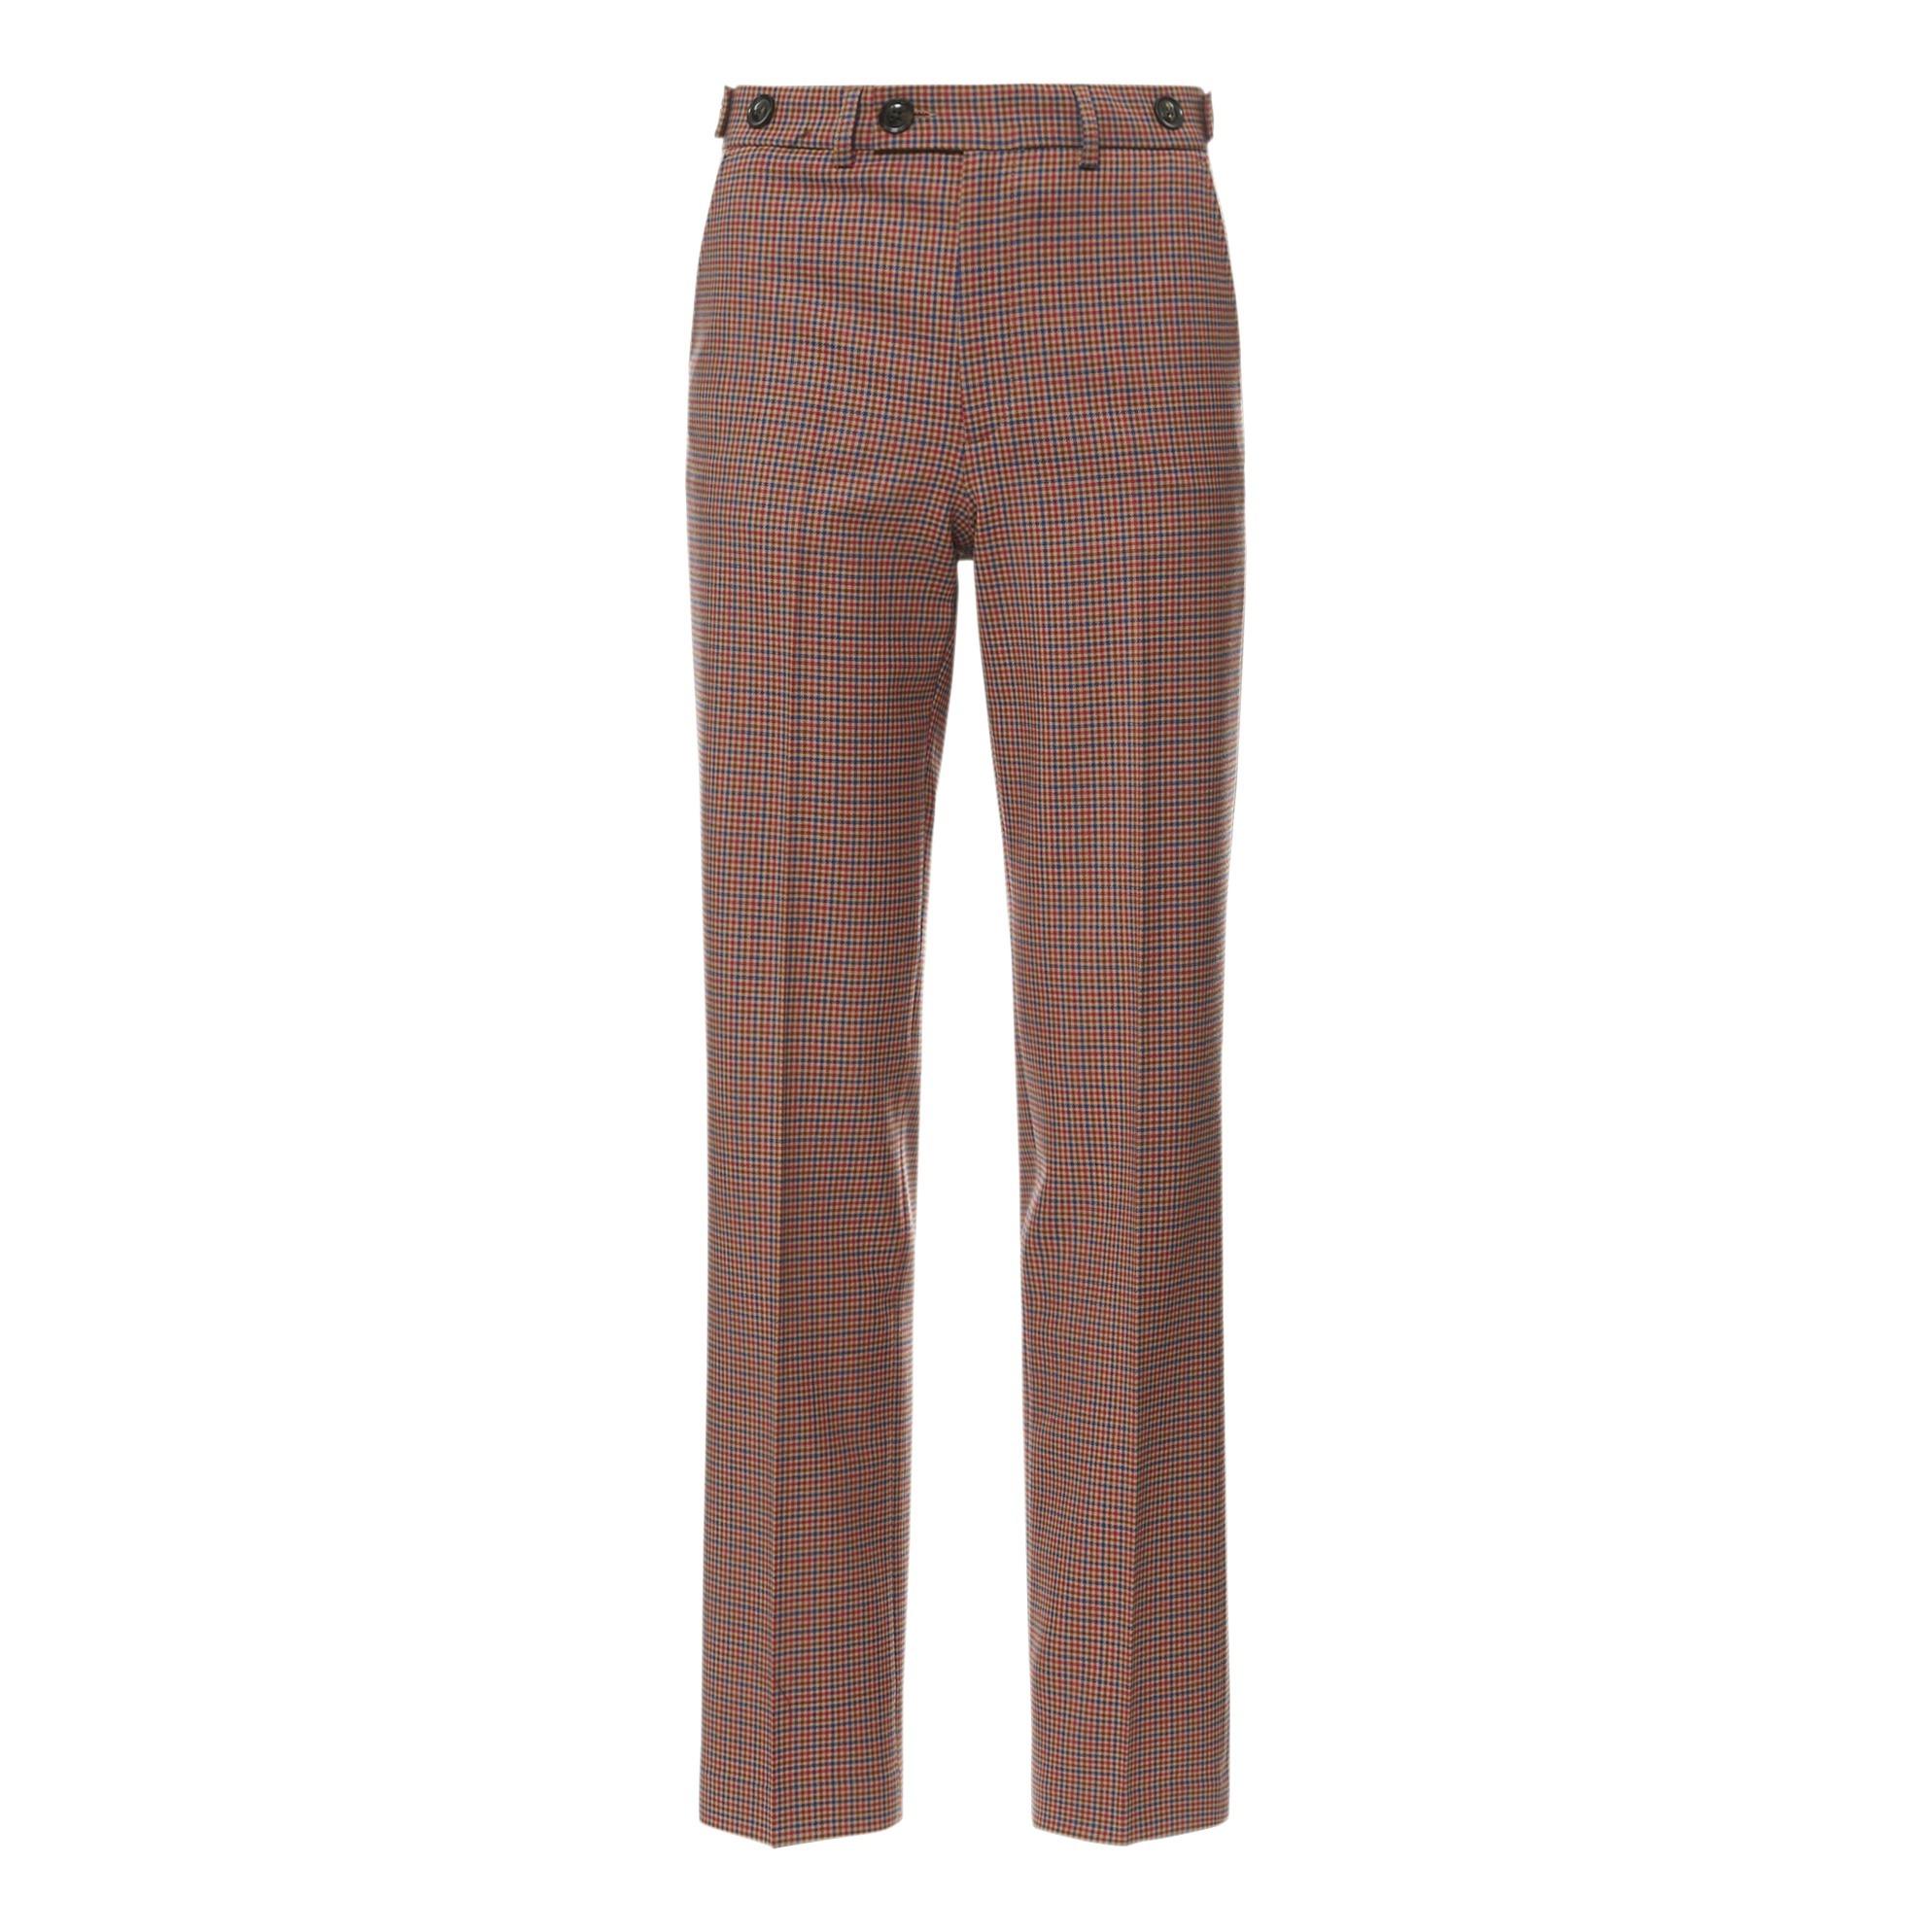 Pantalon Carreaux Philibert